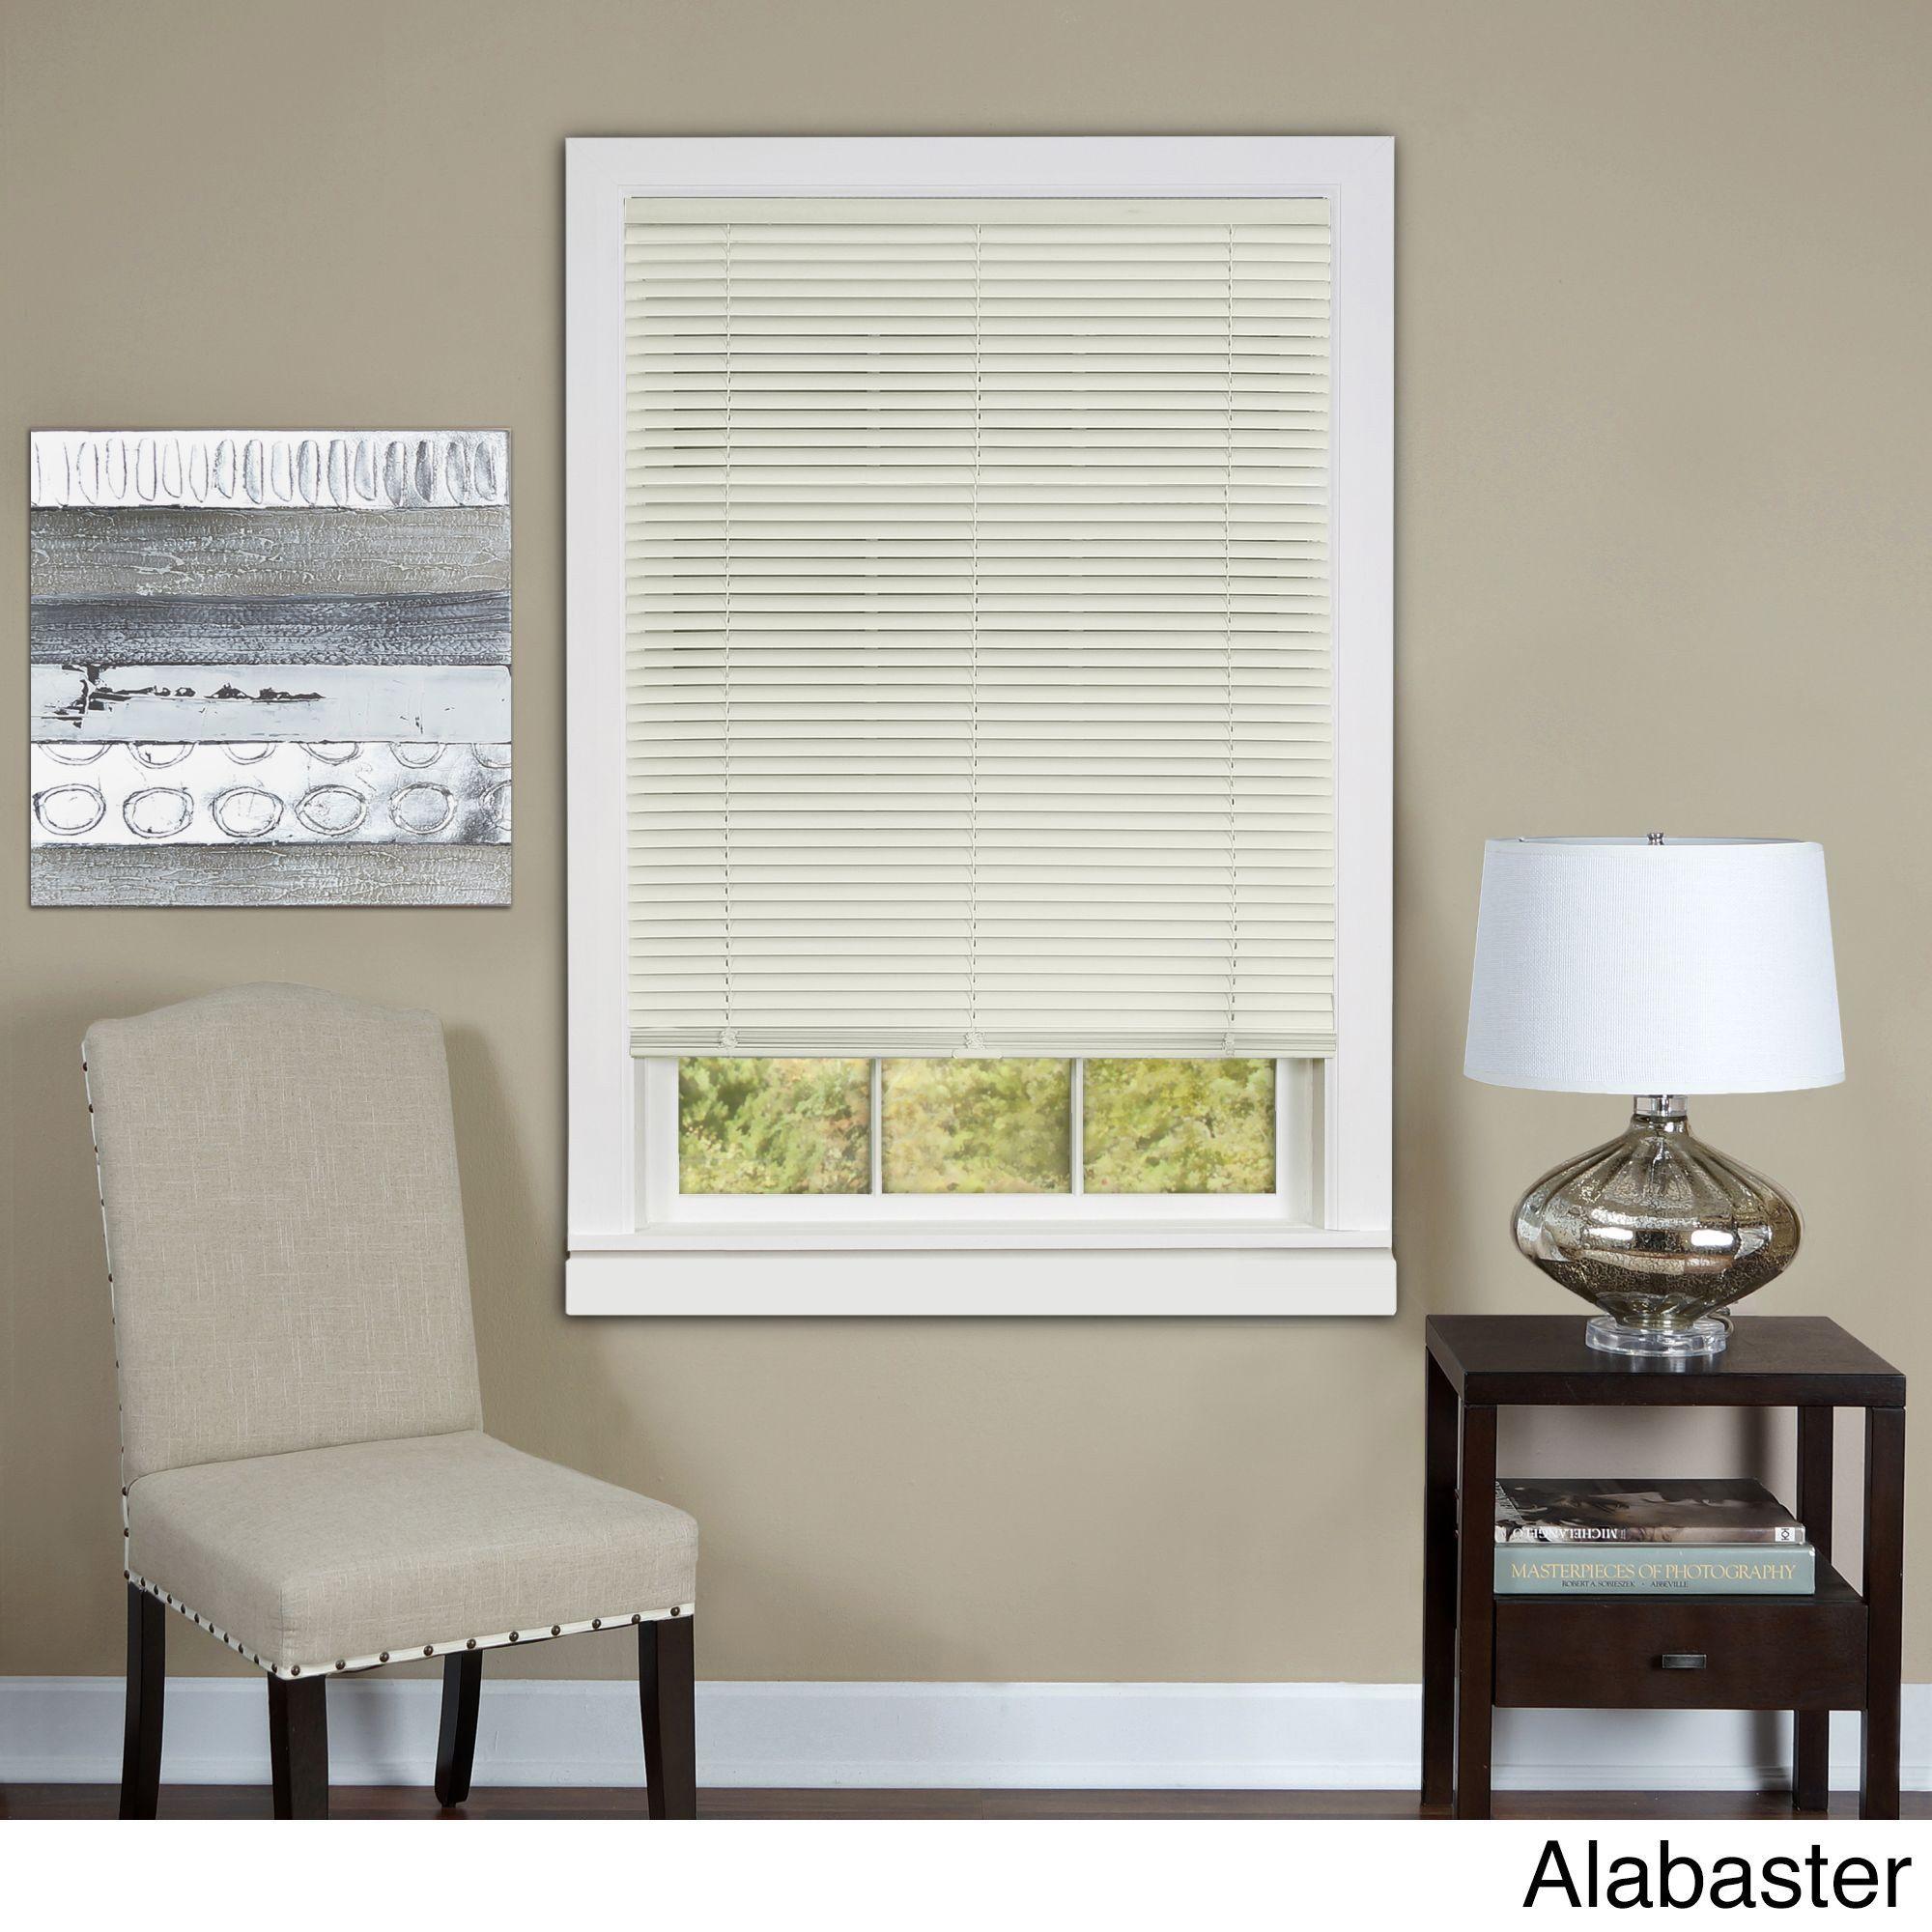 s alabaster zone dusk aluminium cords blinds interiors venetian